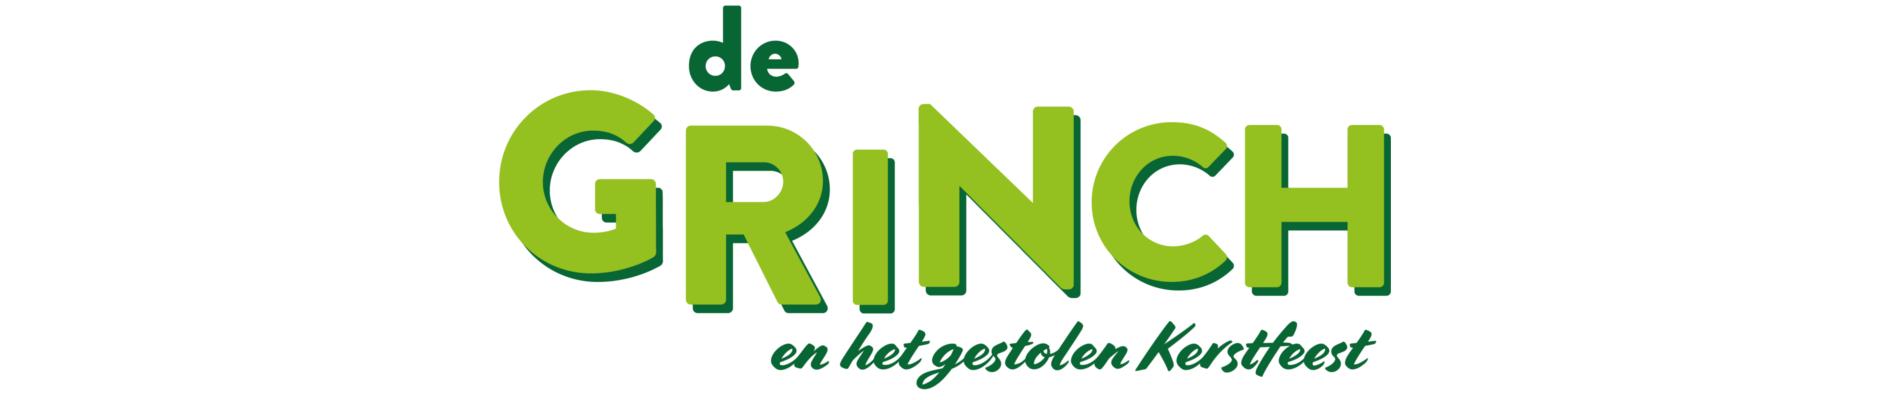 logo-grinch-white